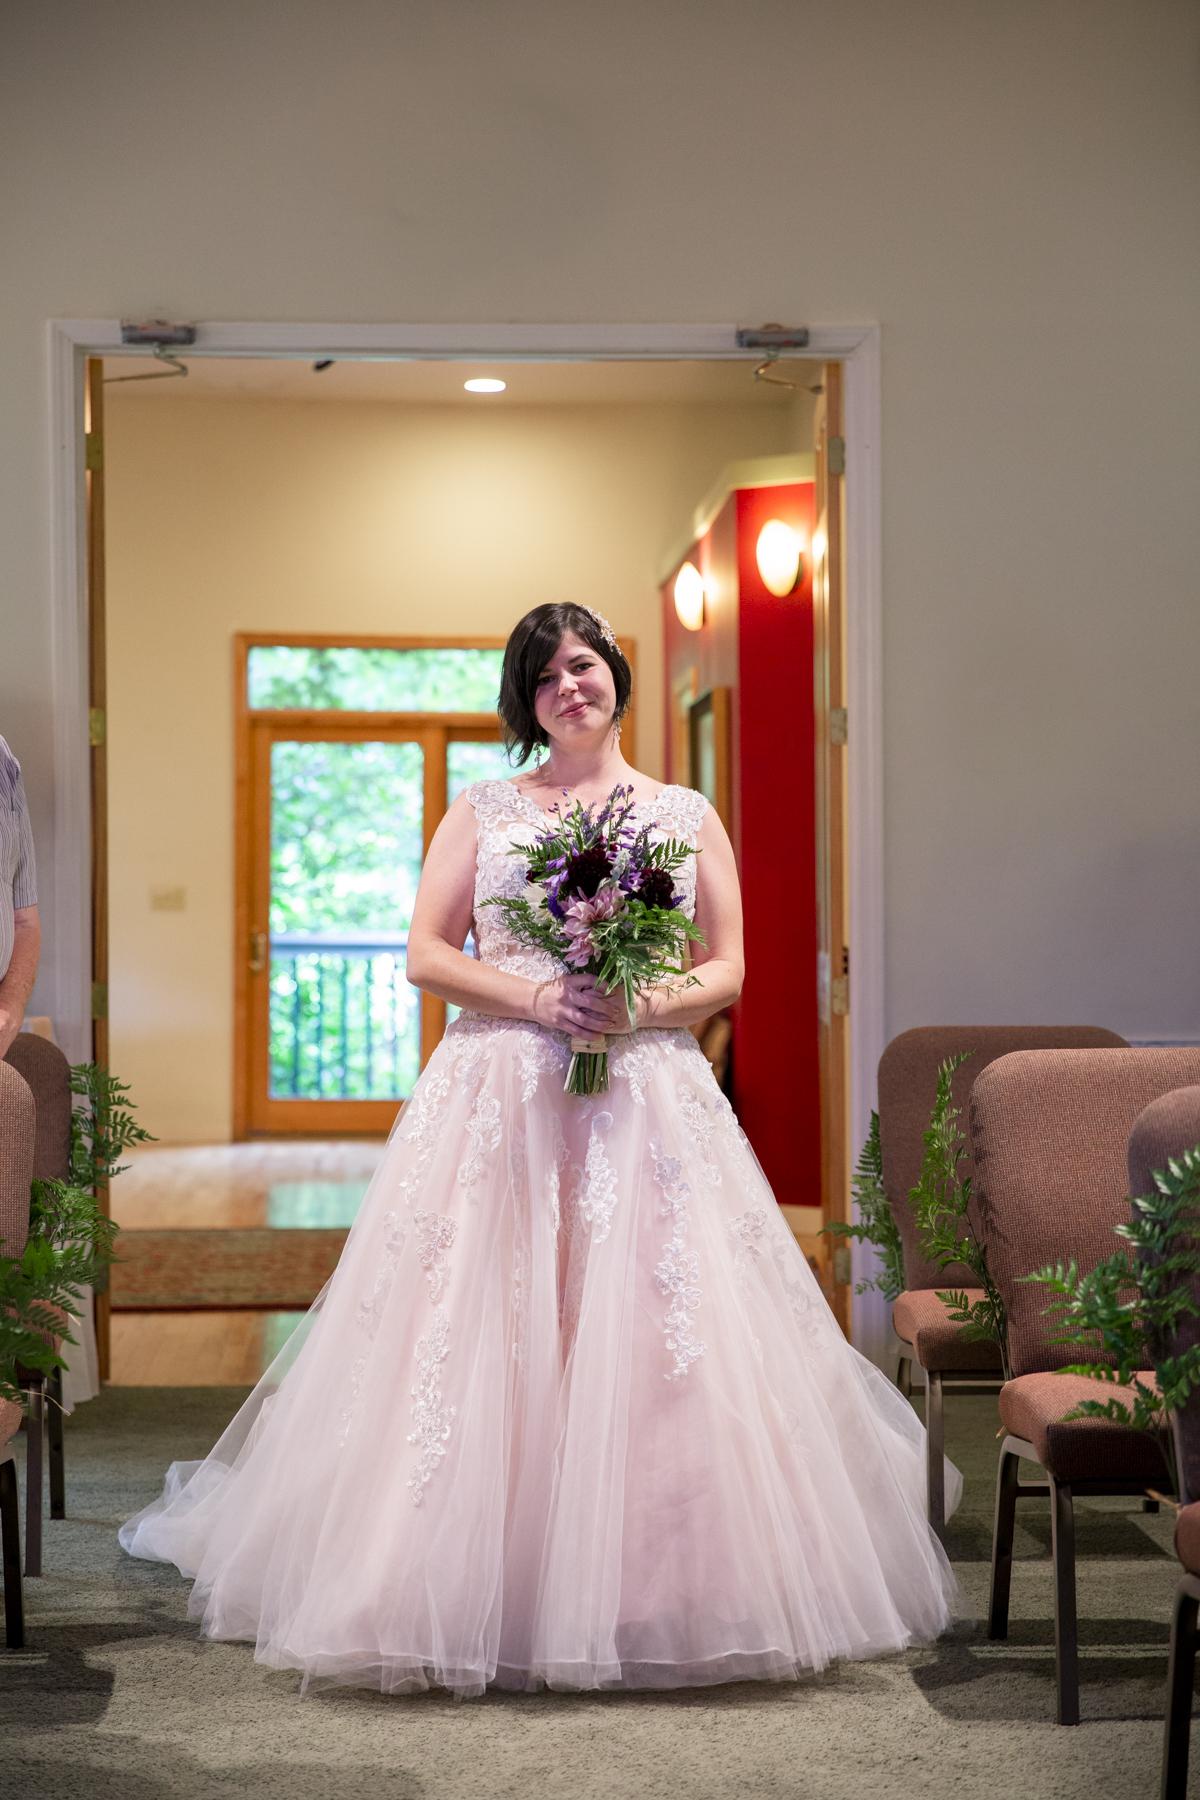 Avyanna and Phoenix Wedding- Photos by Studio Misha_BLOG-51.jpg